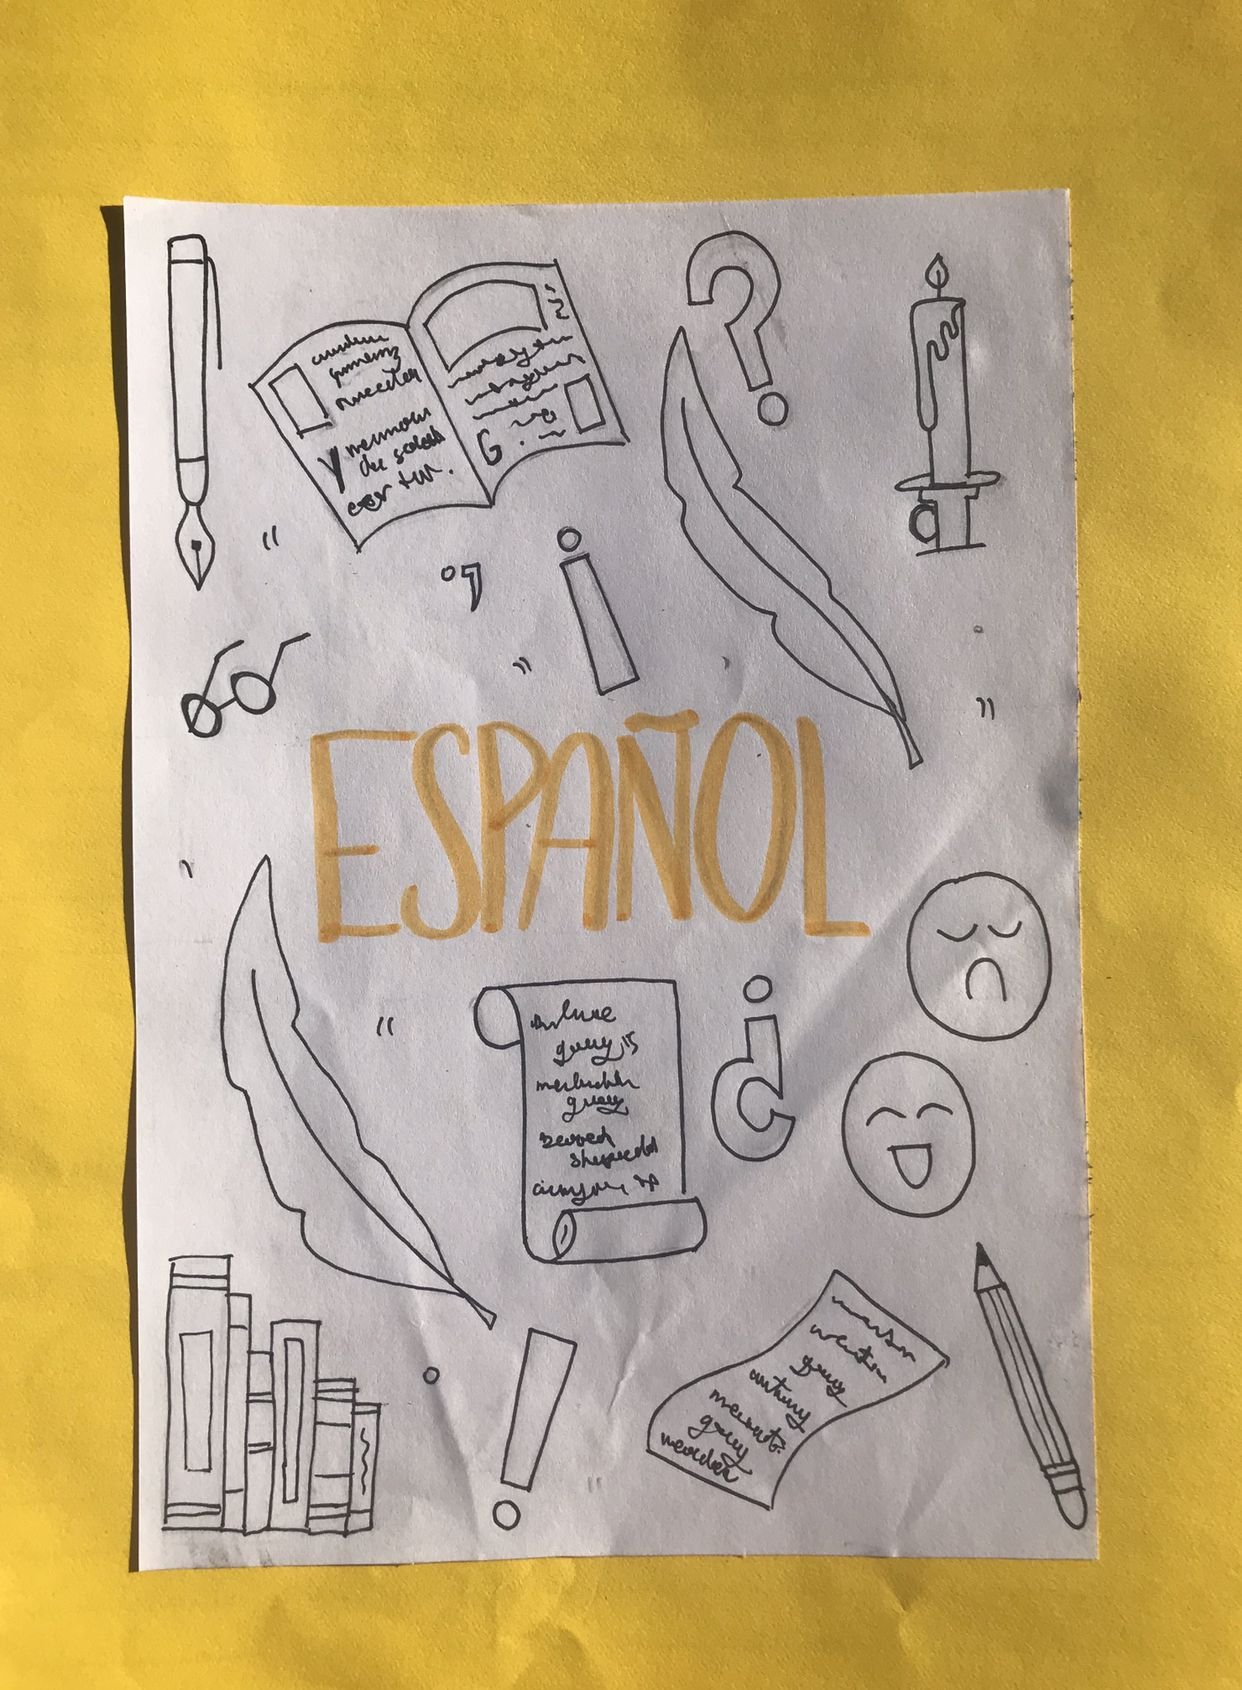 Portada Para Cuadernos De Espanol Portada De Espanol Portada De Cuaderno De Ciencias Portadas De Cuadernos